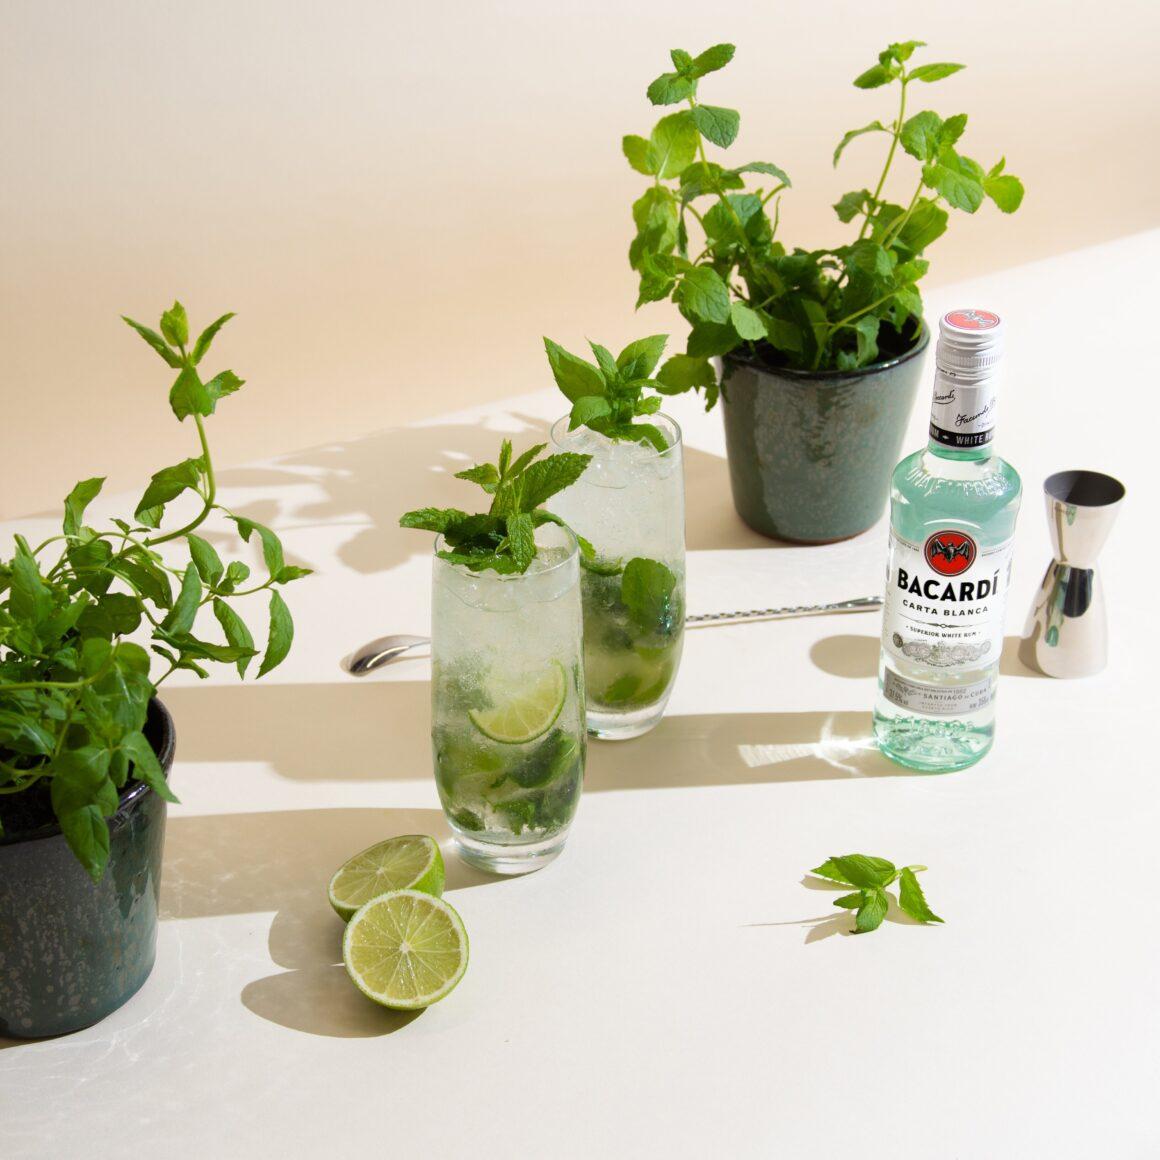 Grow Your Own Garnish Kits - Bacardi X Floom. Bacardi Rum